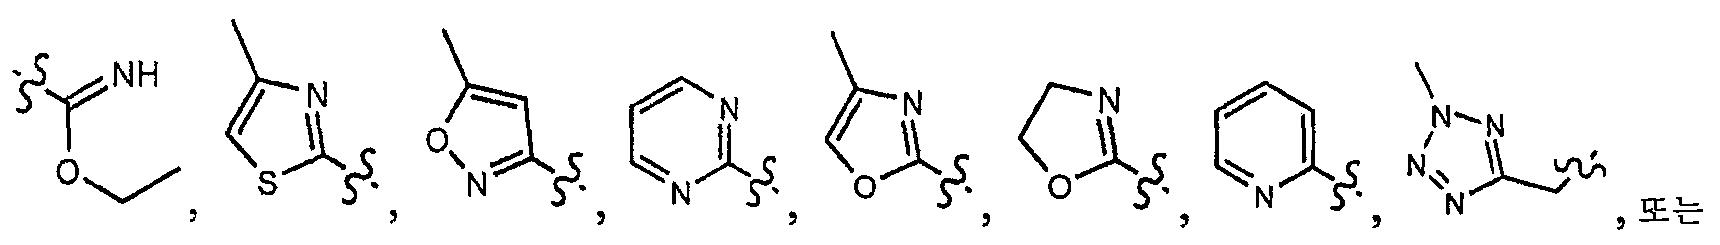 Figure 112007055602908-pct00122